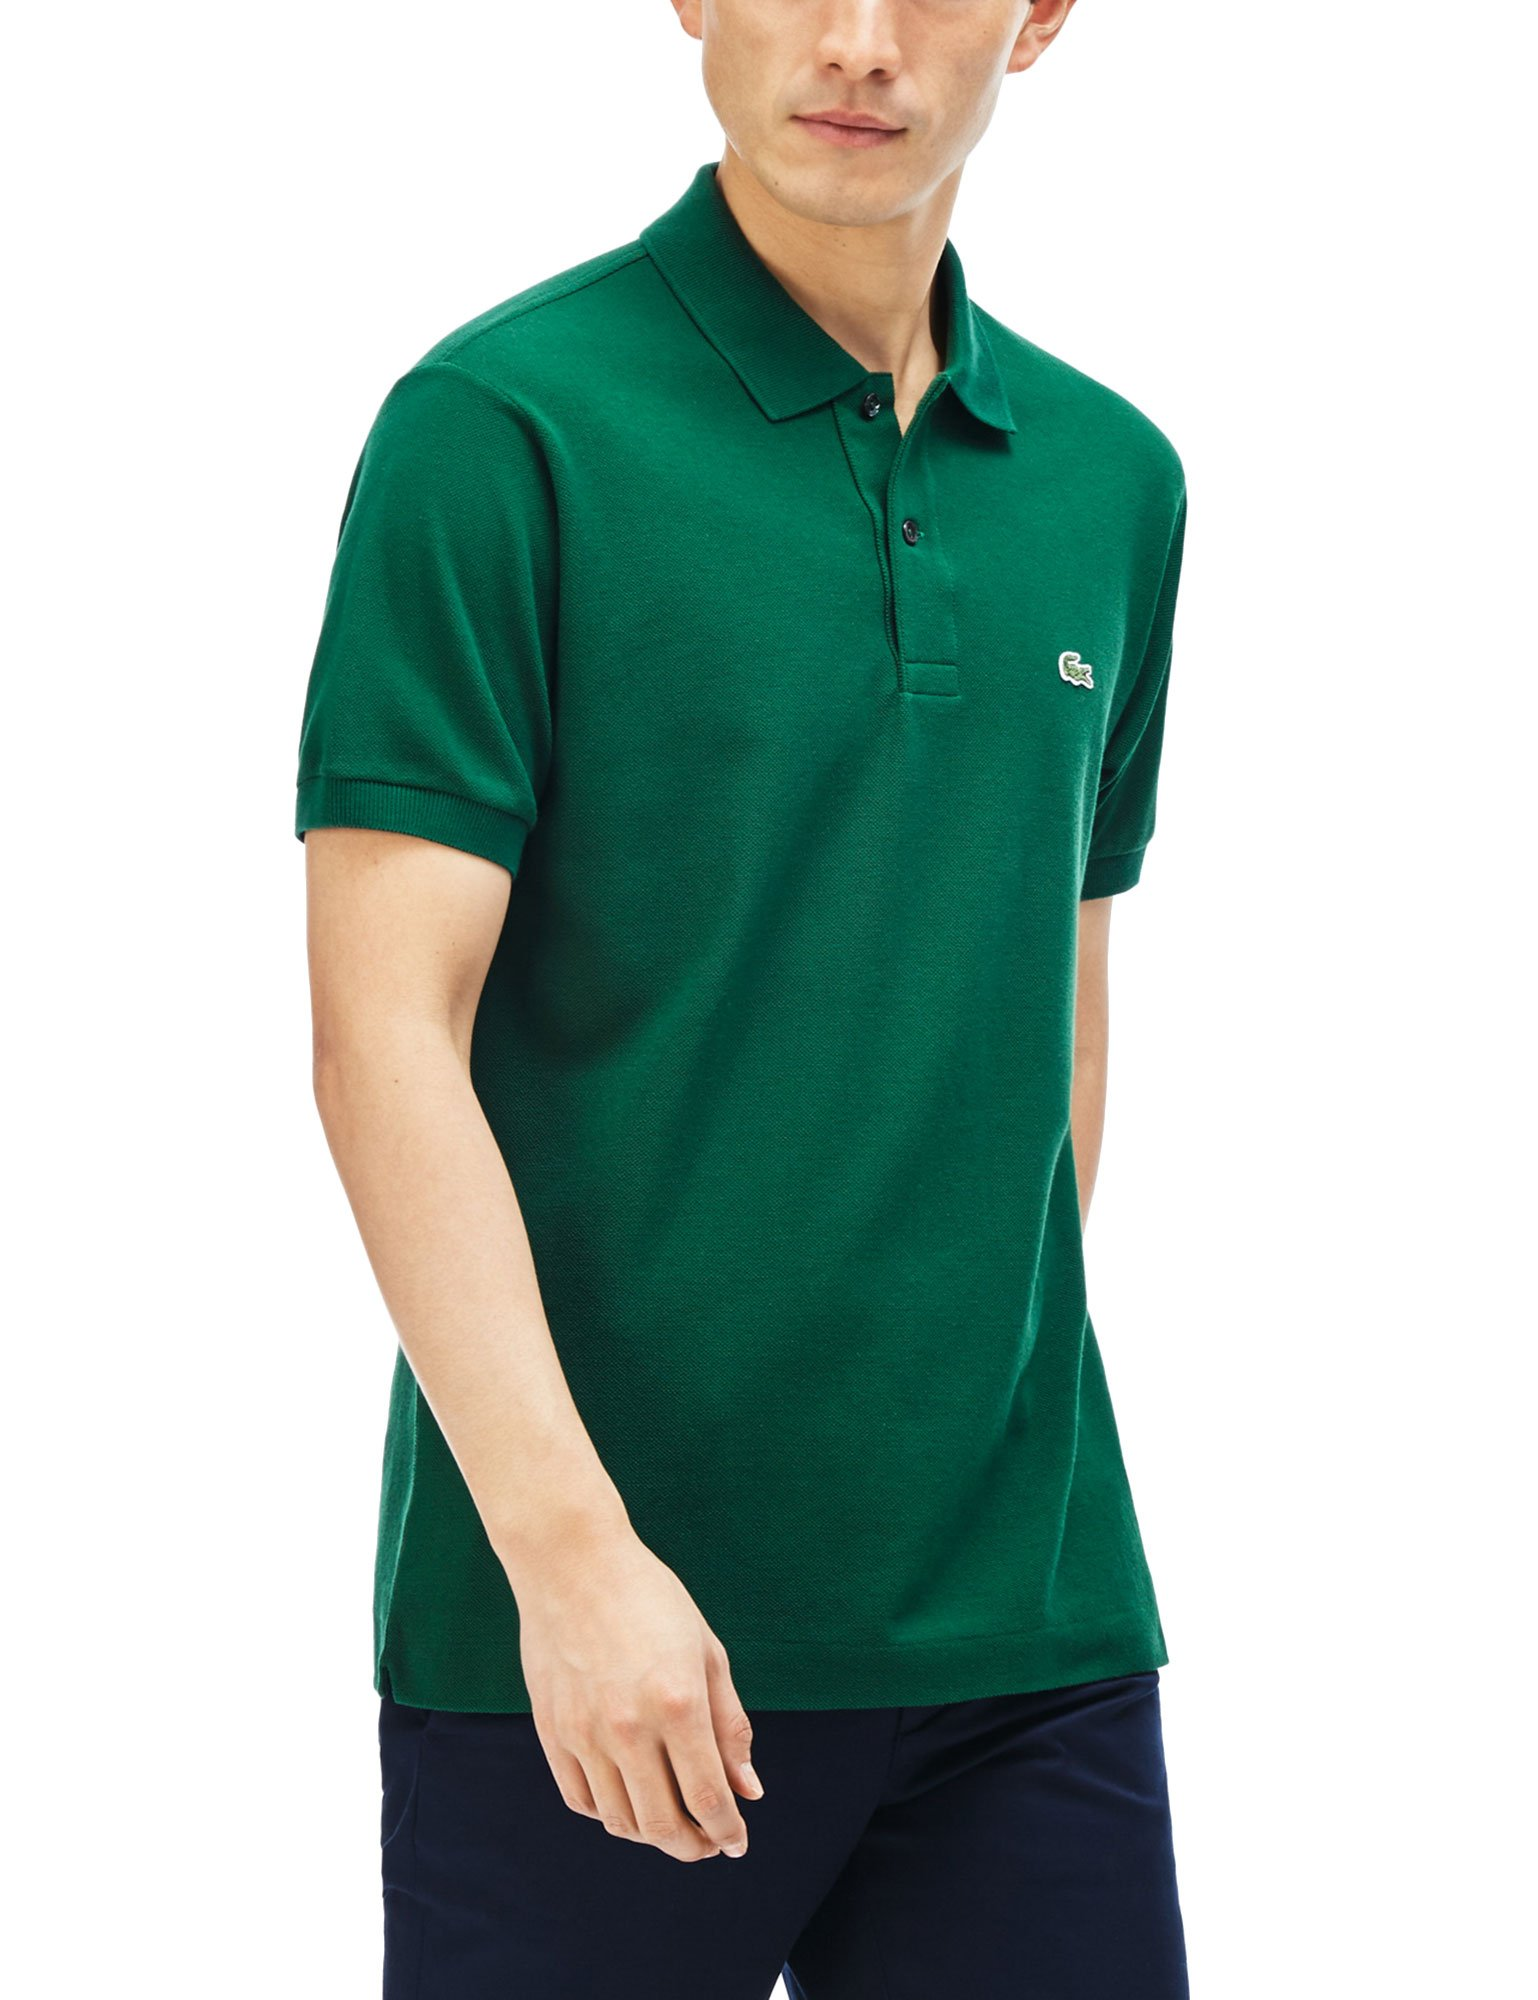 Lacoste Men's Regular Fit Polo T-shirt L1212-132 Xl Green